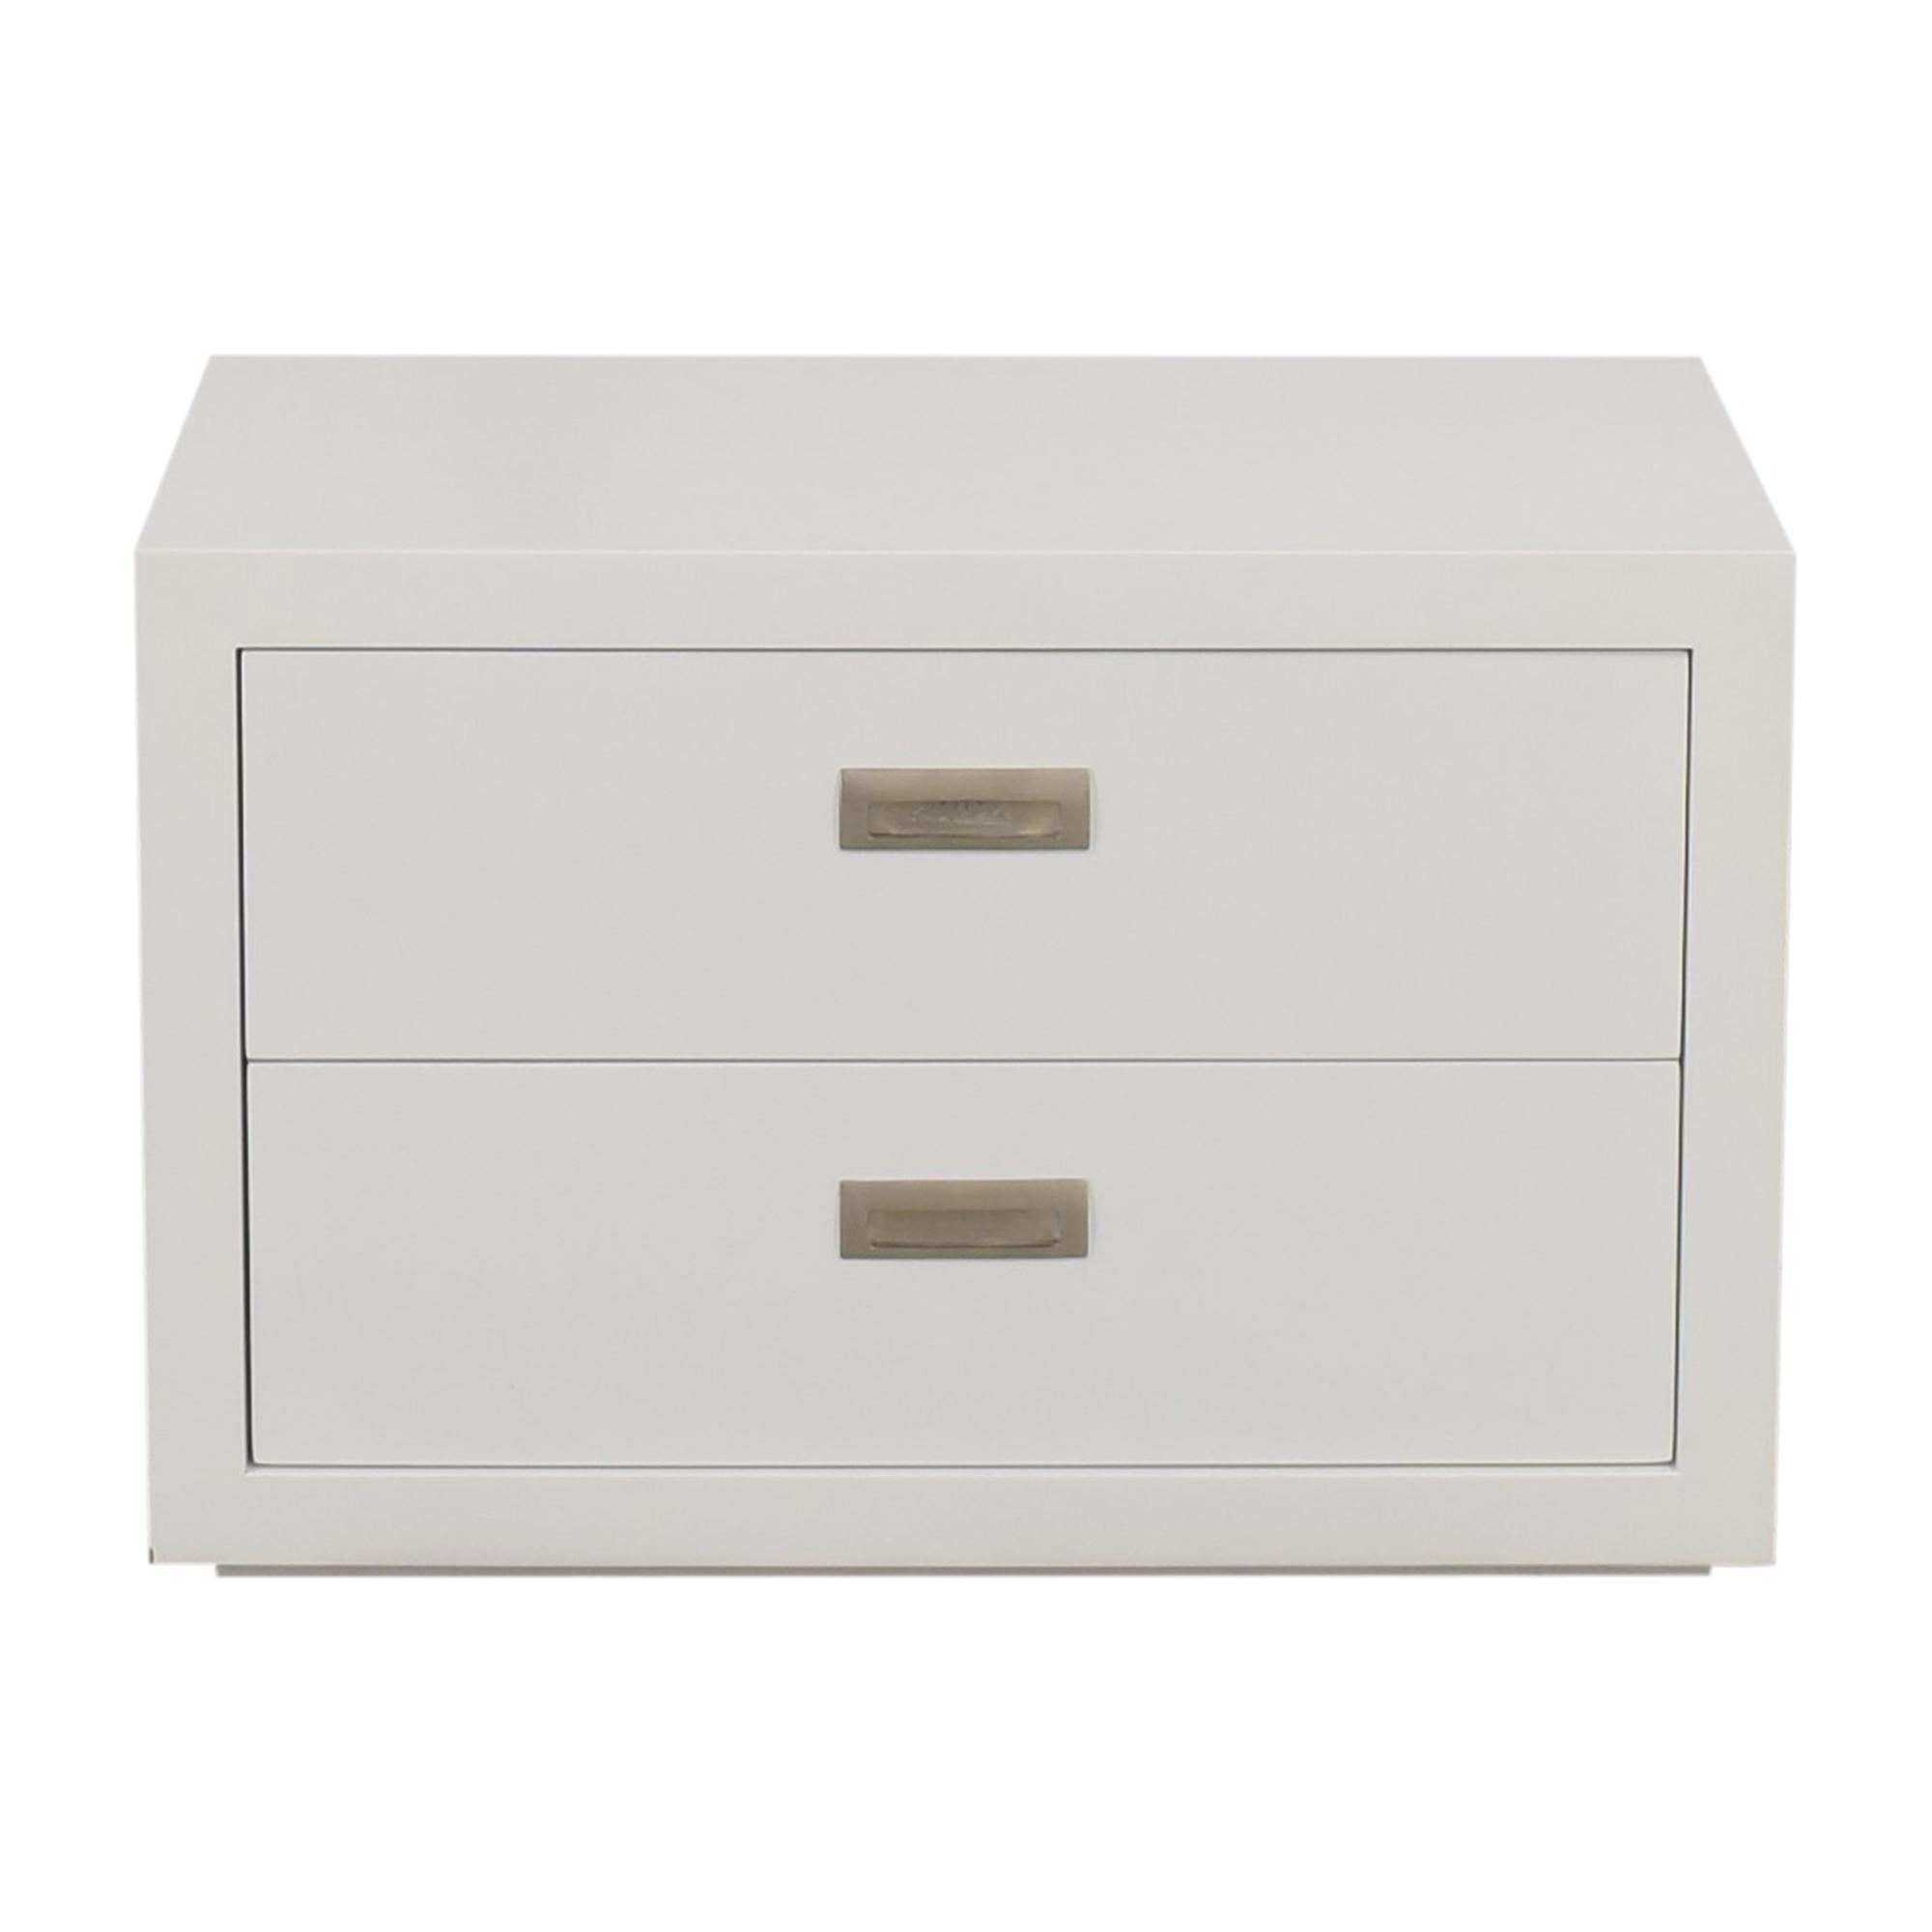 Crate & Barrel Crate & Barrel Aspect Modular 2-Drawer Storage Unit white